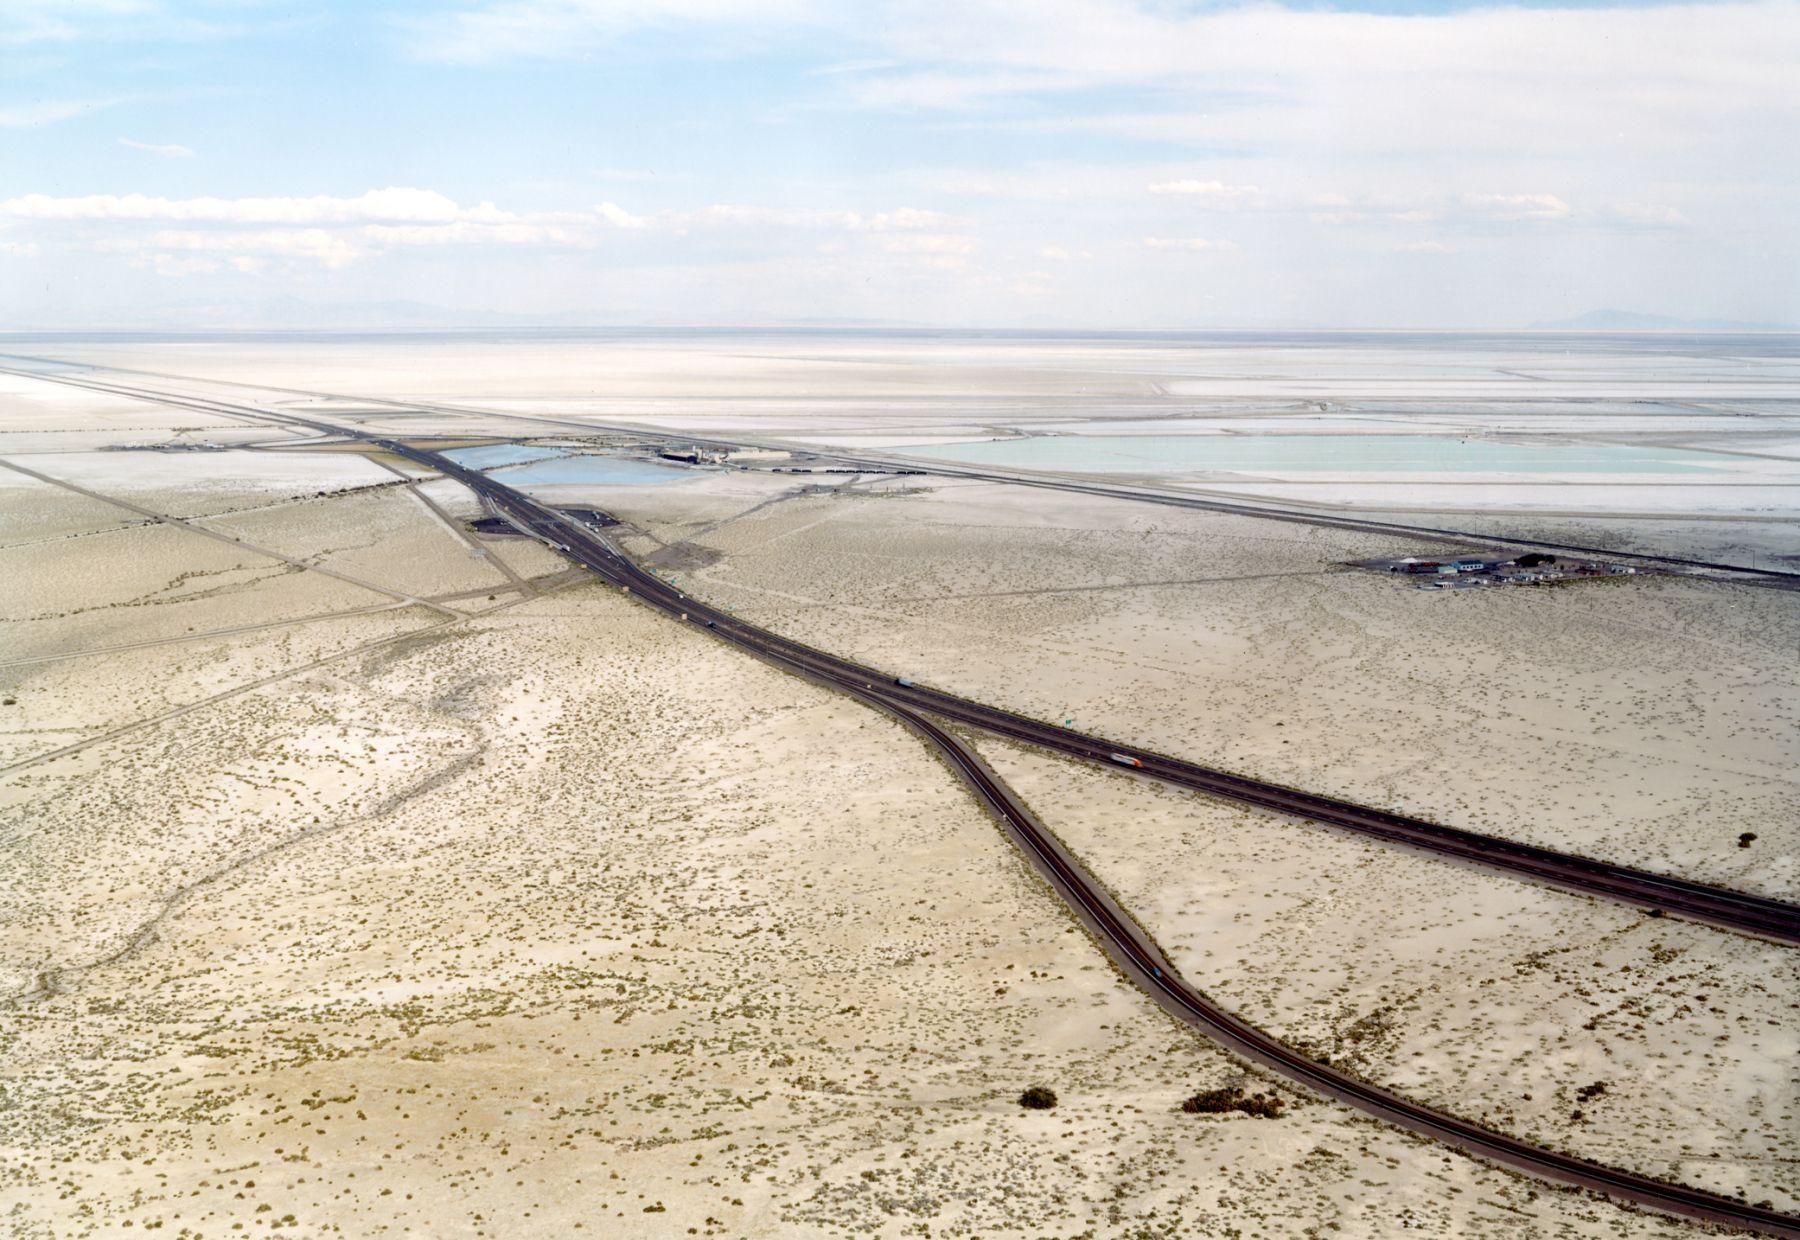 Untitled, Potash Mine, Wendover, Utah, 2004, 39 x 55 inch or 55 x 75 inch chromogenic print.